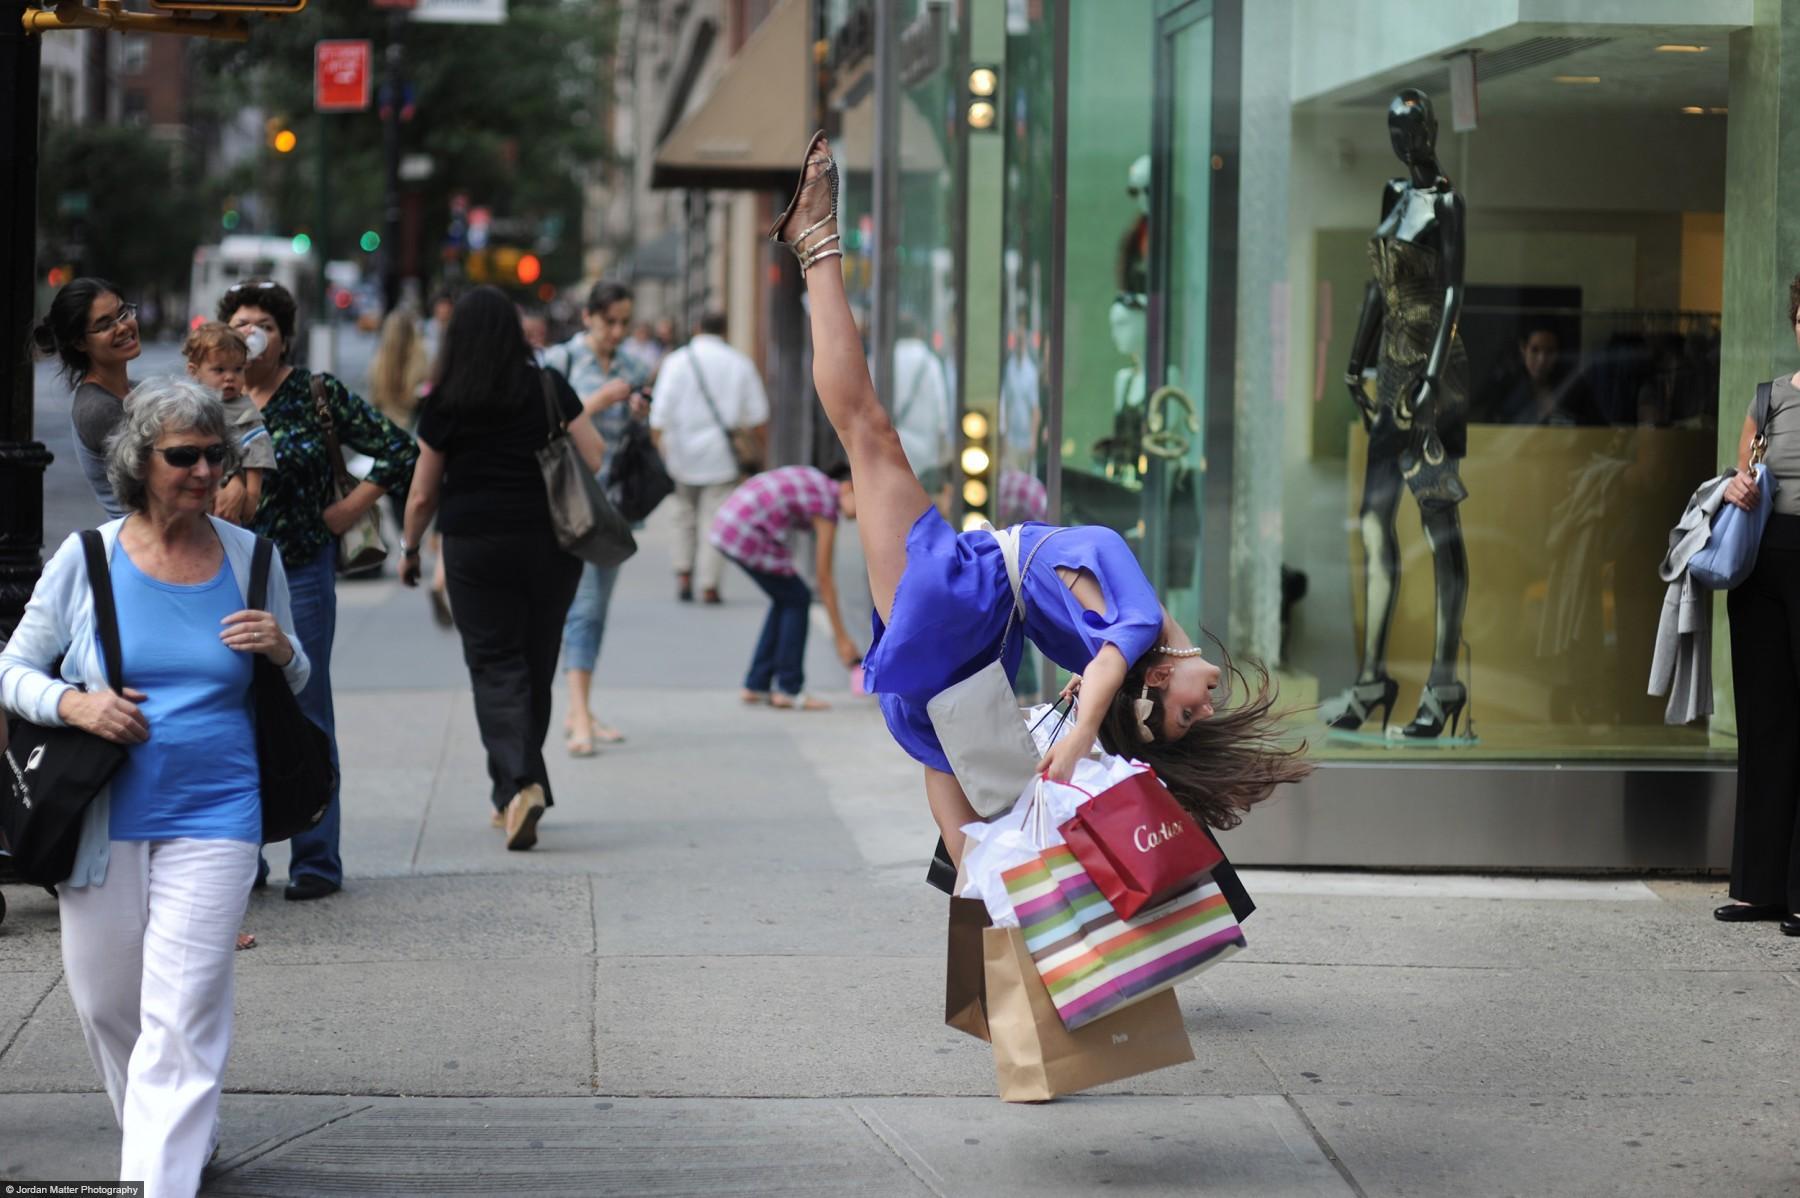 Картинки смешные про шопинг, мая картинки